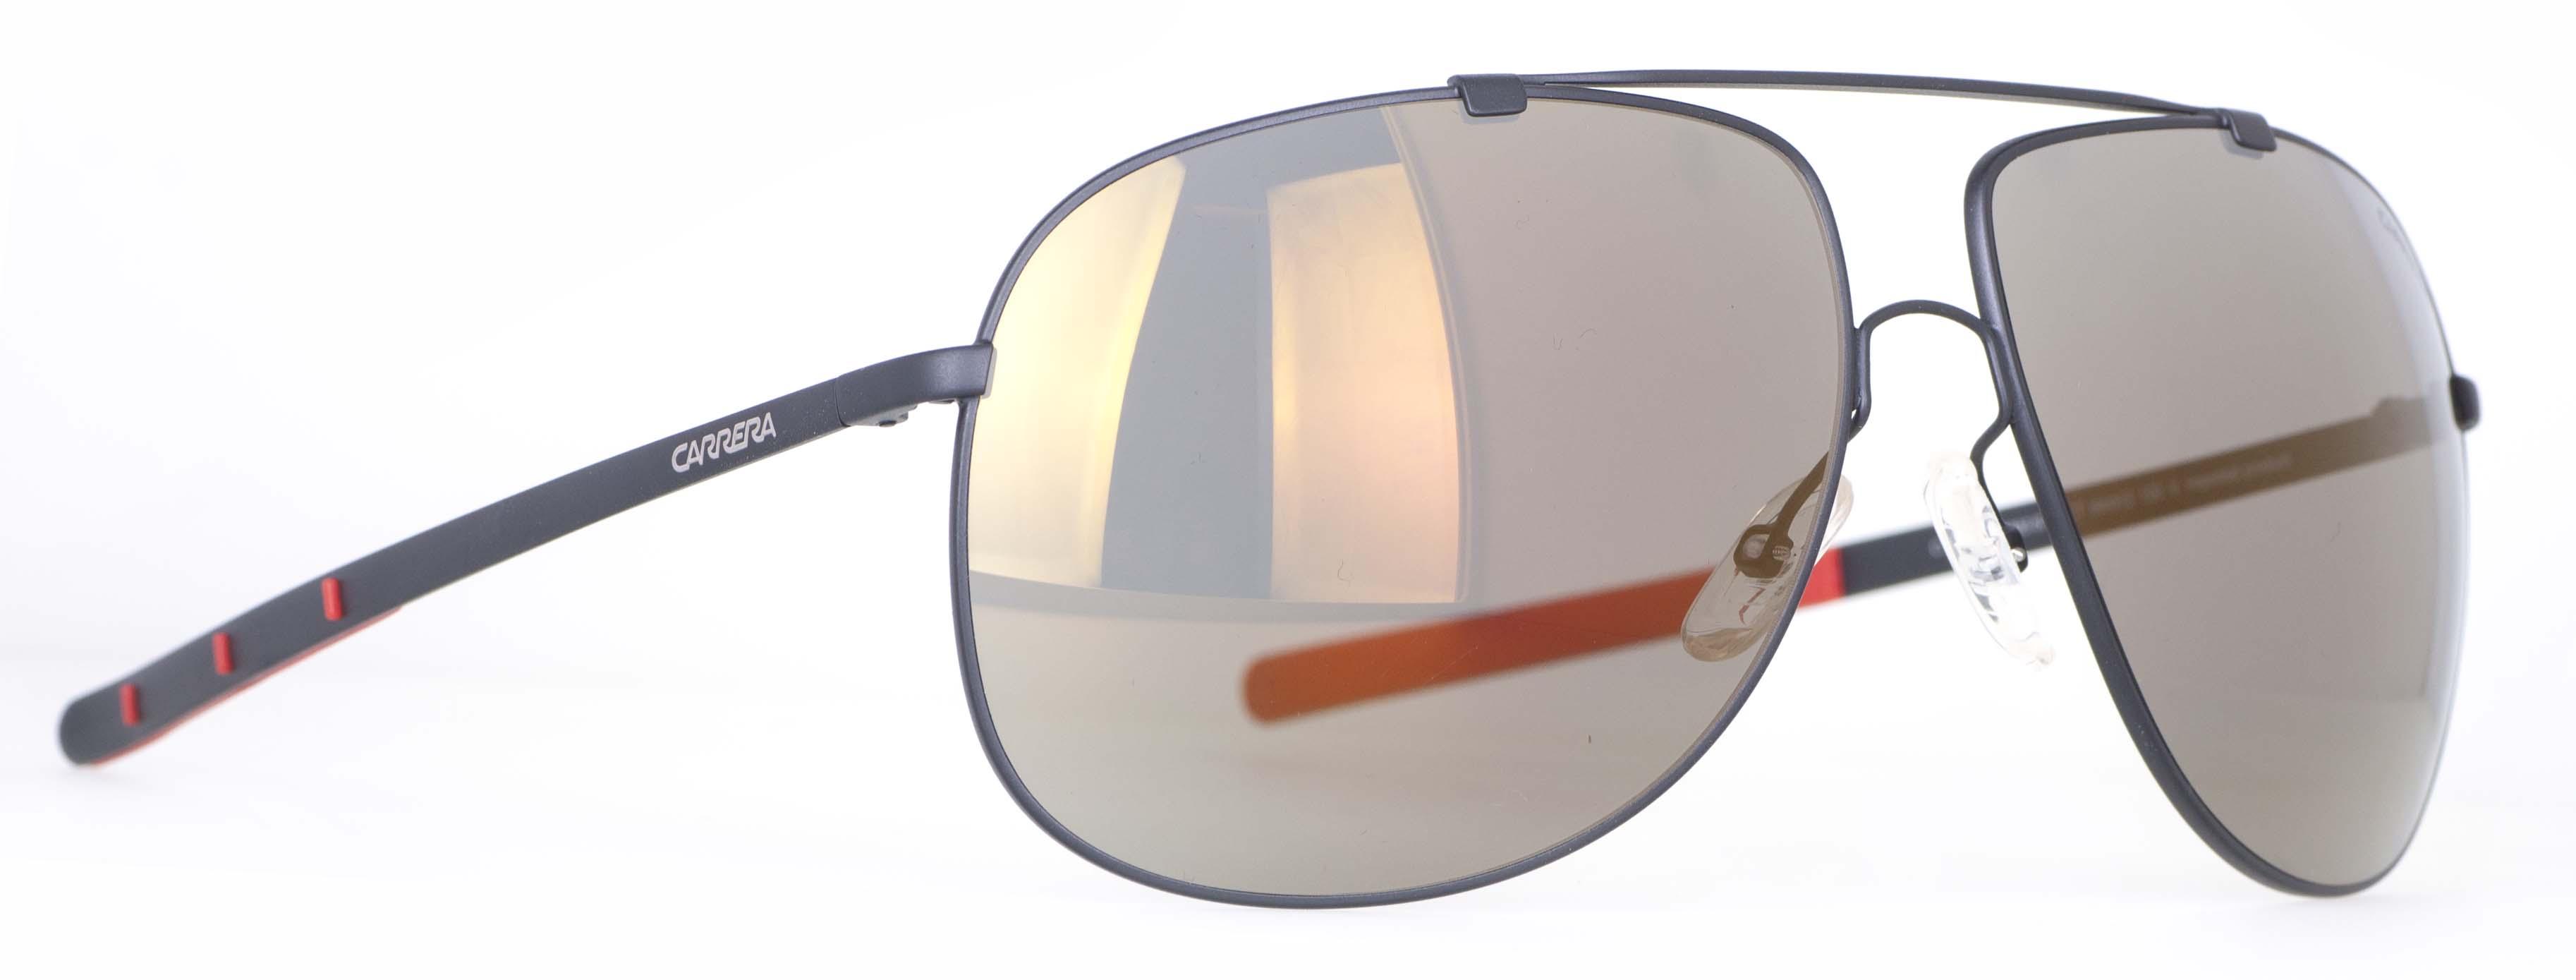 95e78ac6a59e Carrera Aviator Sunglasses Ebay